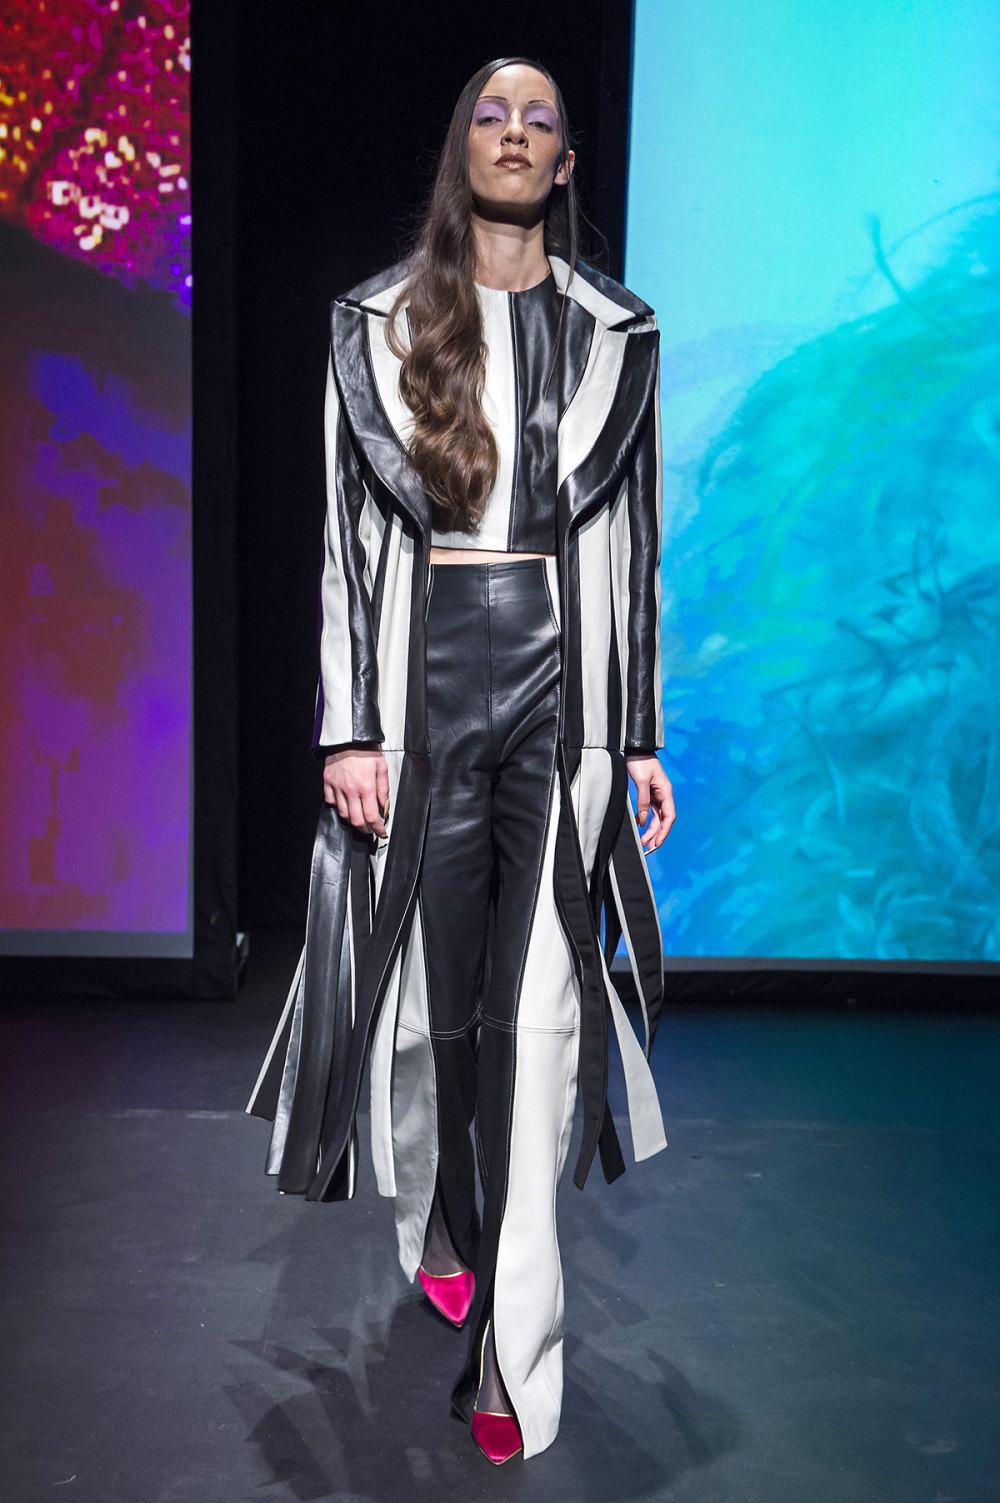 16Arlington时装系列标志性的時尚单色西装外还有更大胆的版本-2.jpg